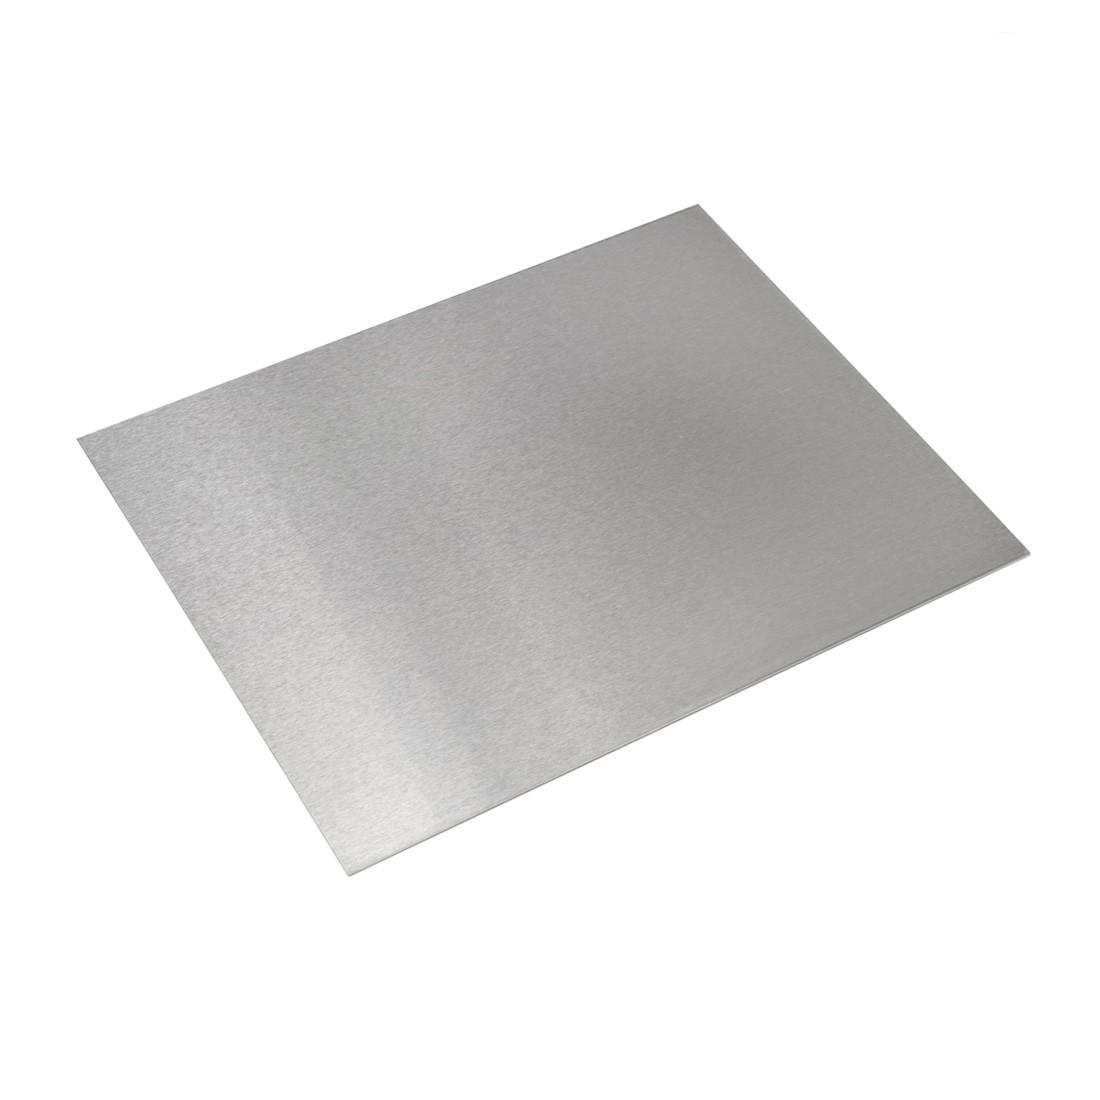 Planchas de aluminio 0,5 mm.250x200